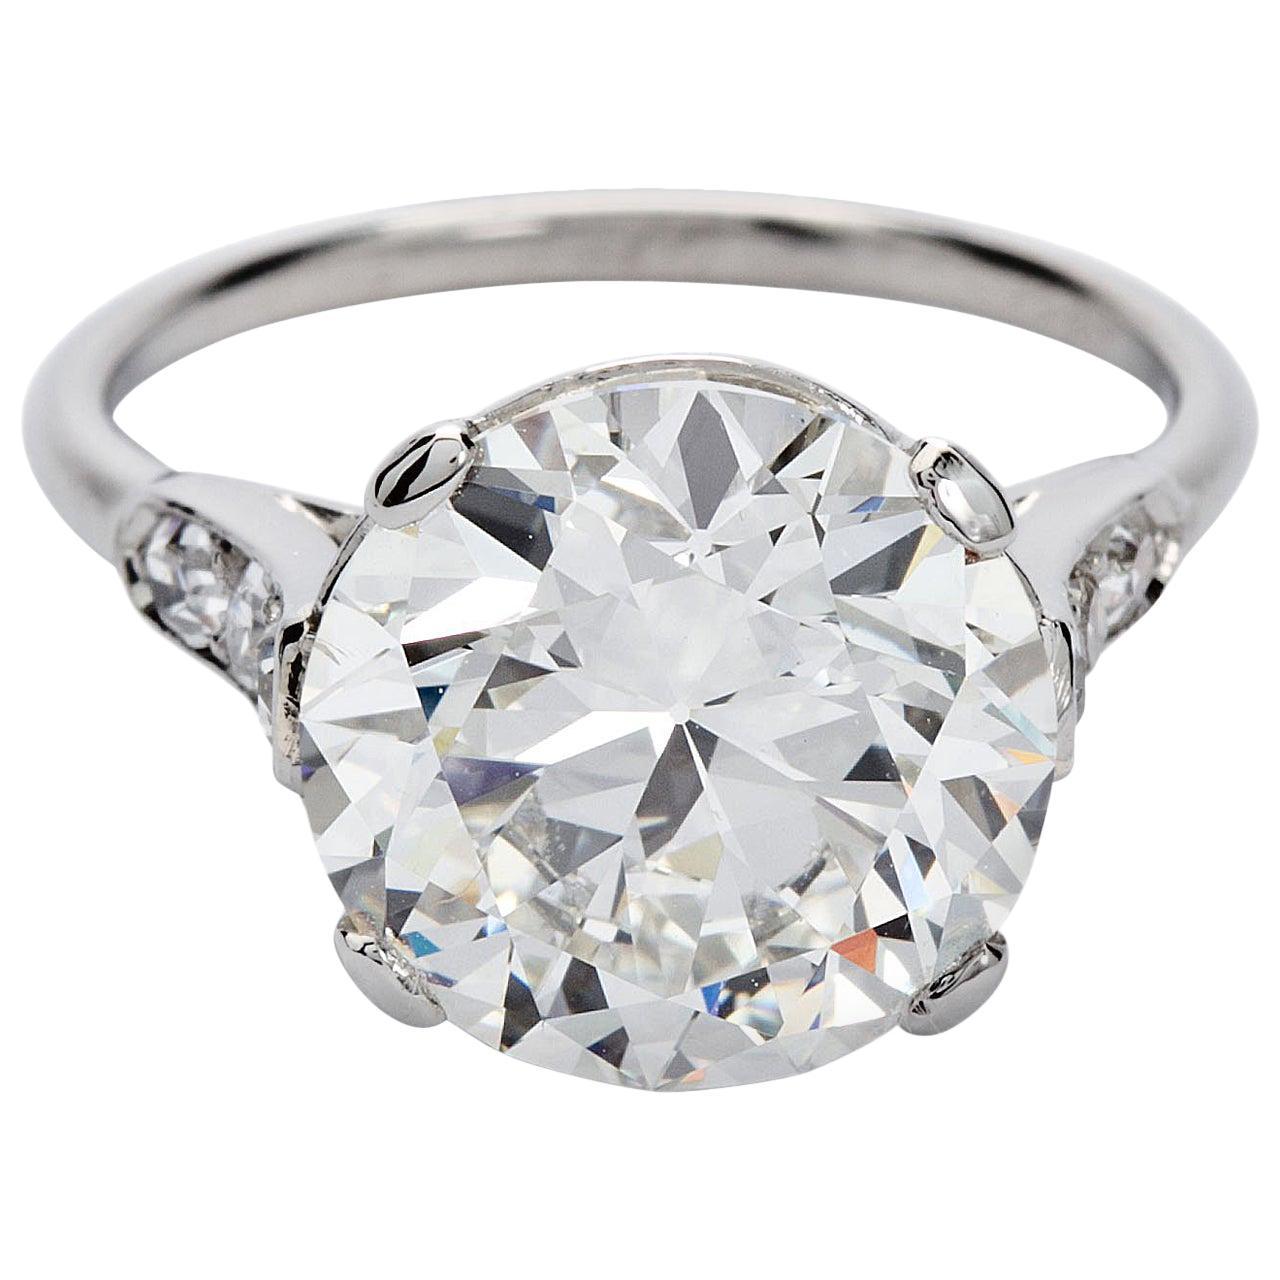 Cartier Paris Round Brilliant Diamond Engagement Ring 4.41 Carat White Gold GIA